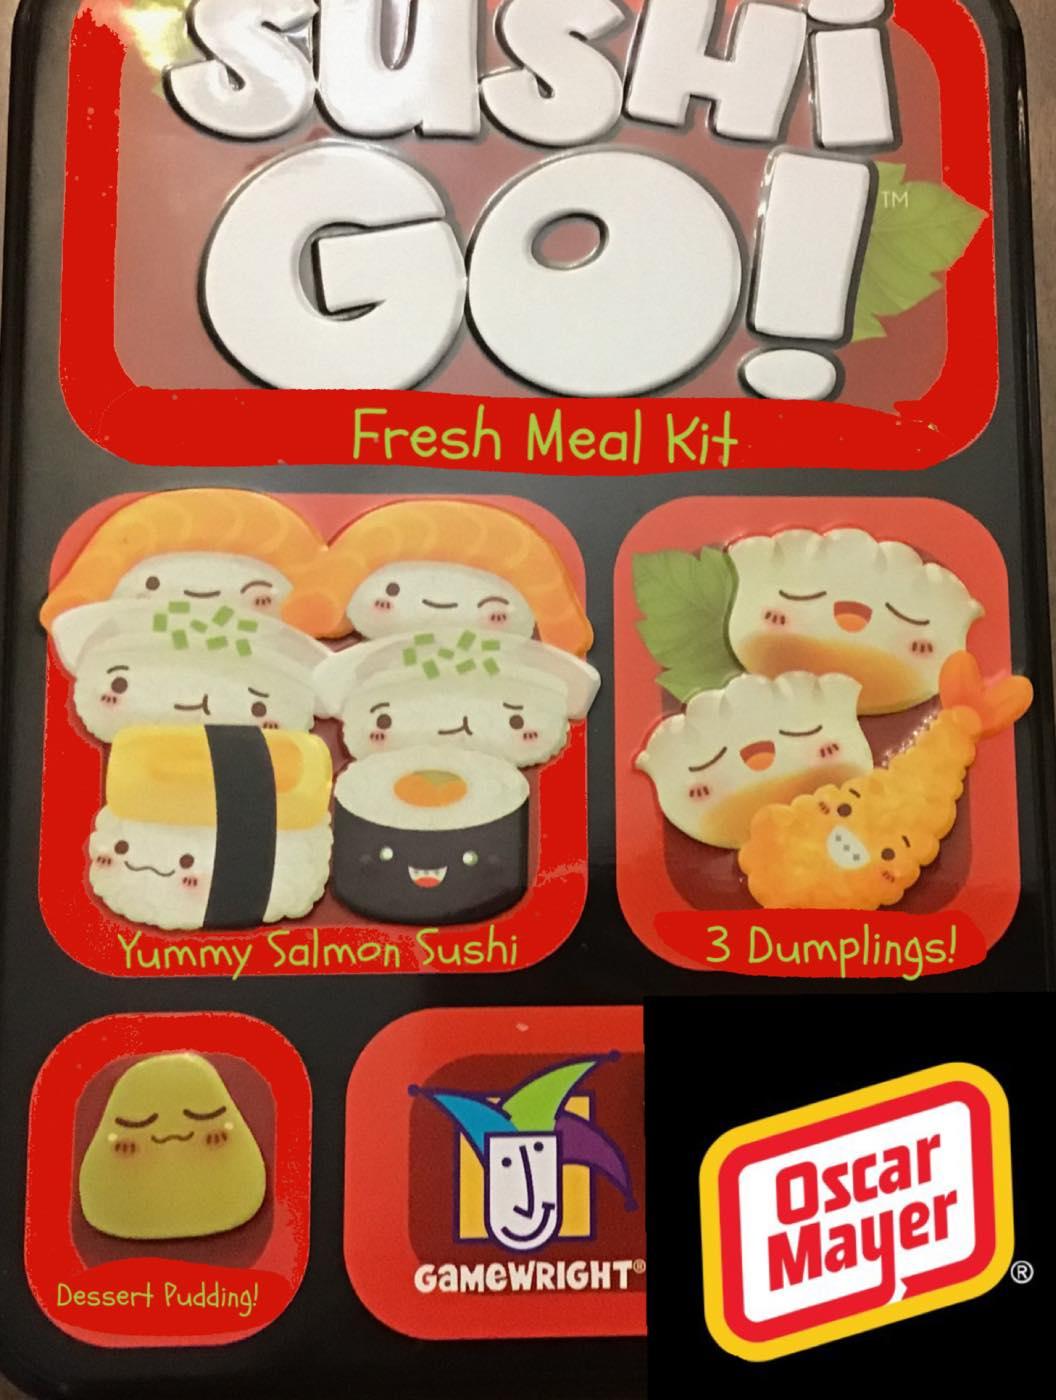 Sushi Go Meal Kit announced